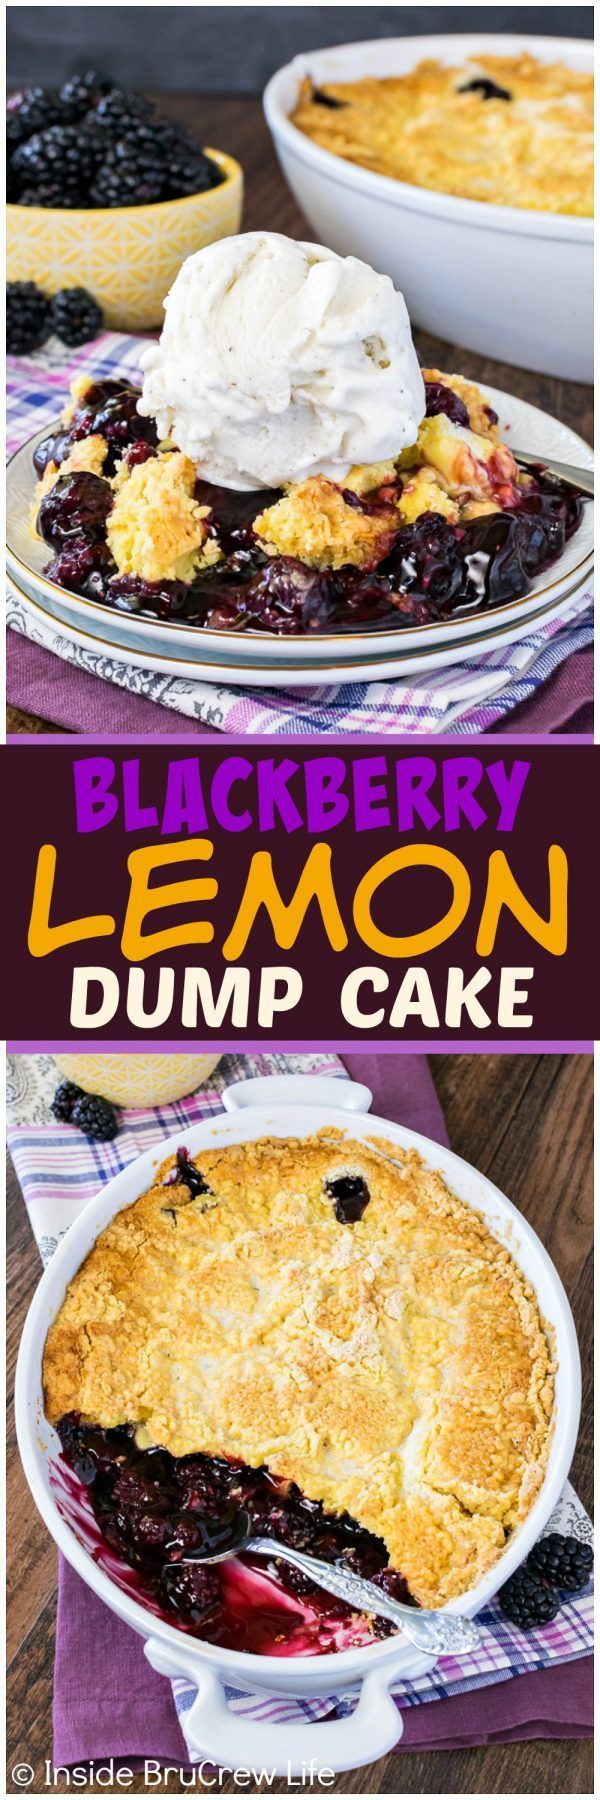 Blackberry Lemon Dump Cake - a crispy lemon topping with gooey blackberry pie filling makes an awesome summer dessert recipe. It's so good with vanilla ice cream!